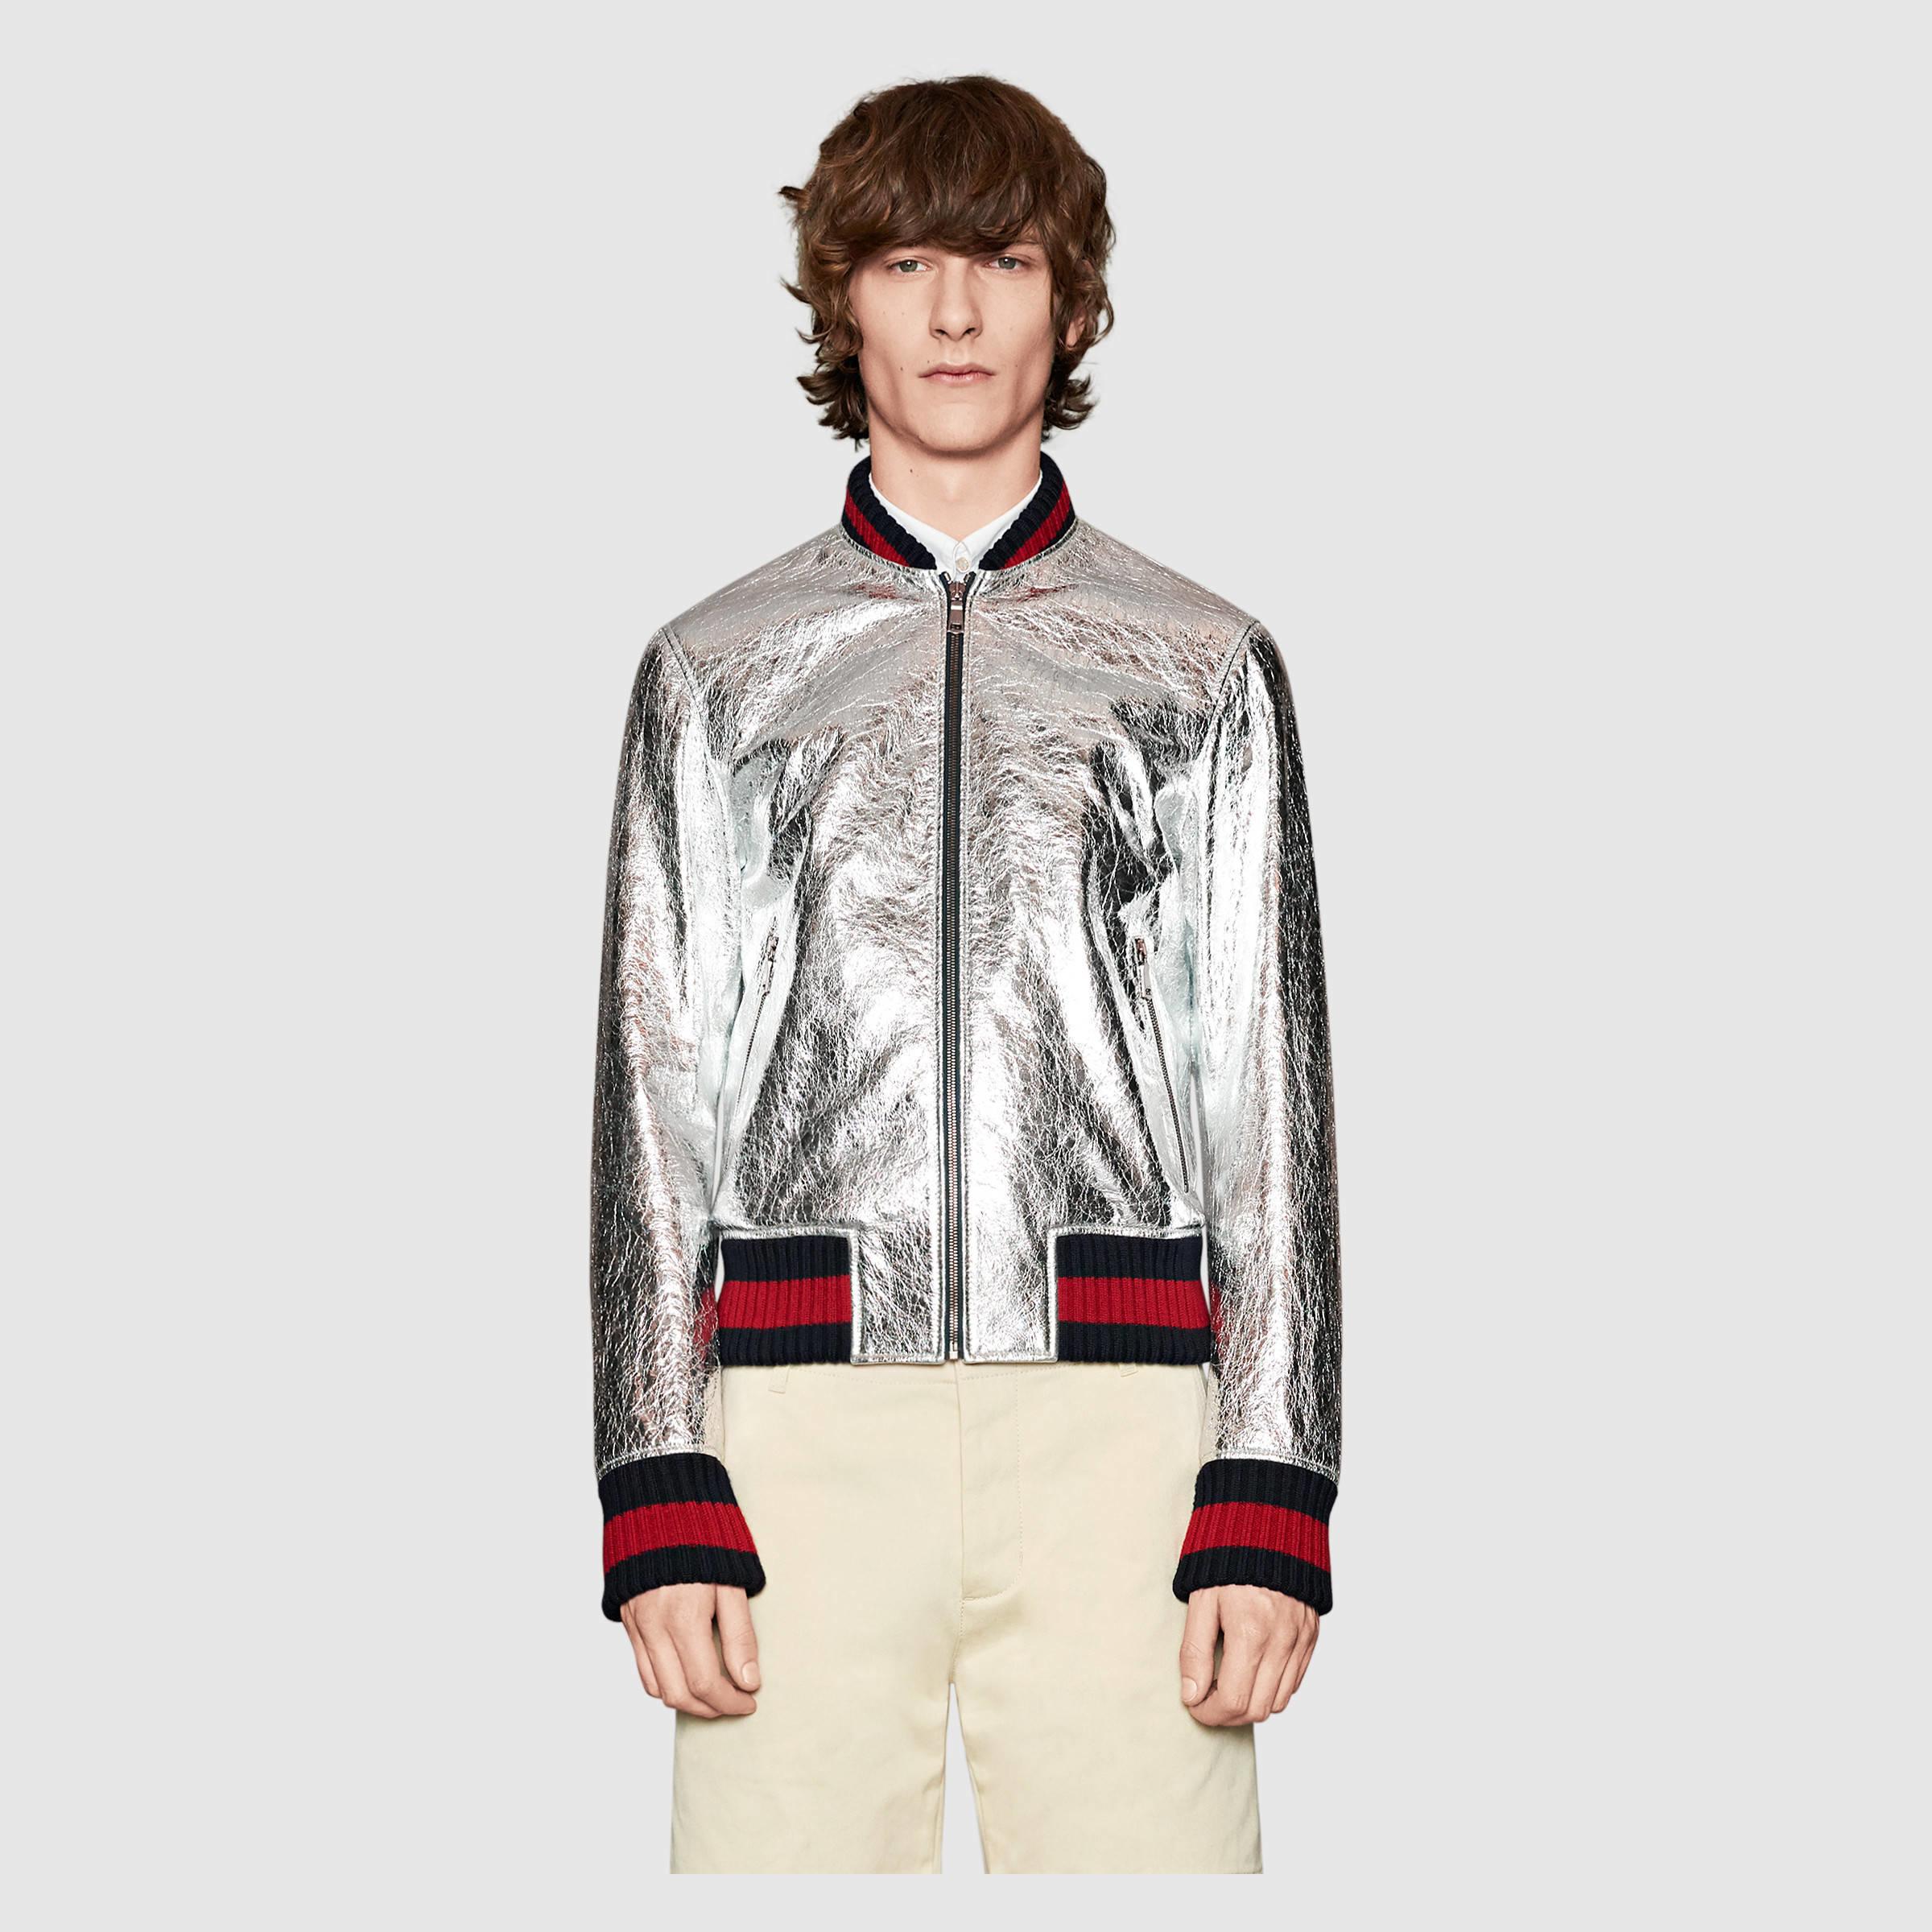 d79ae1d01 Men's Crackle Leather Duchesse Bomber Jacket